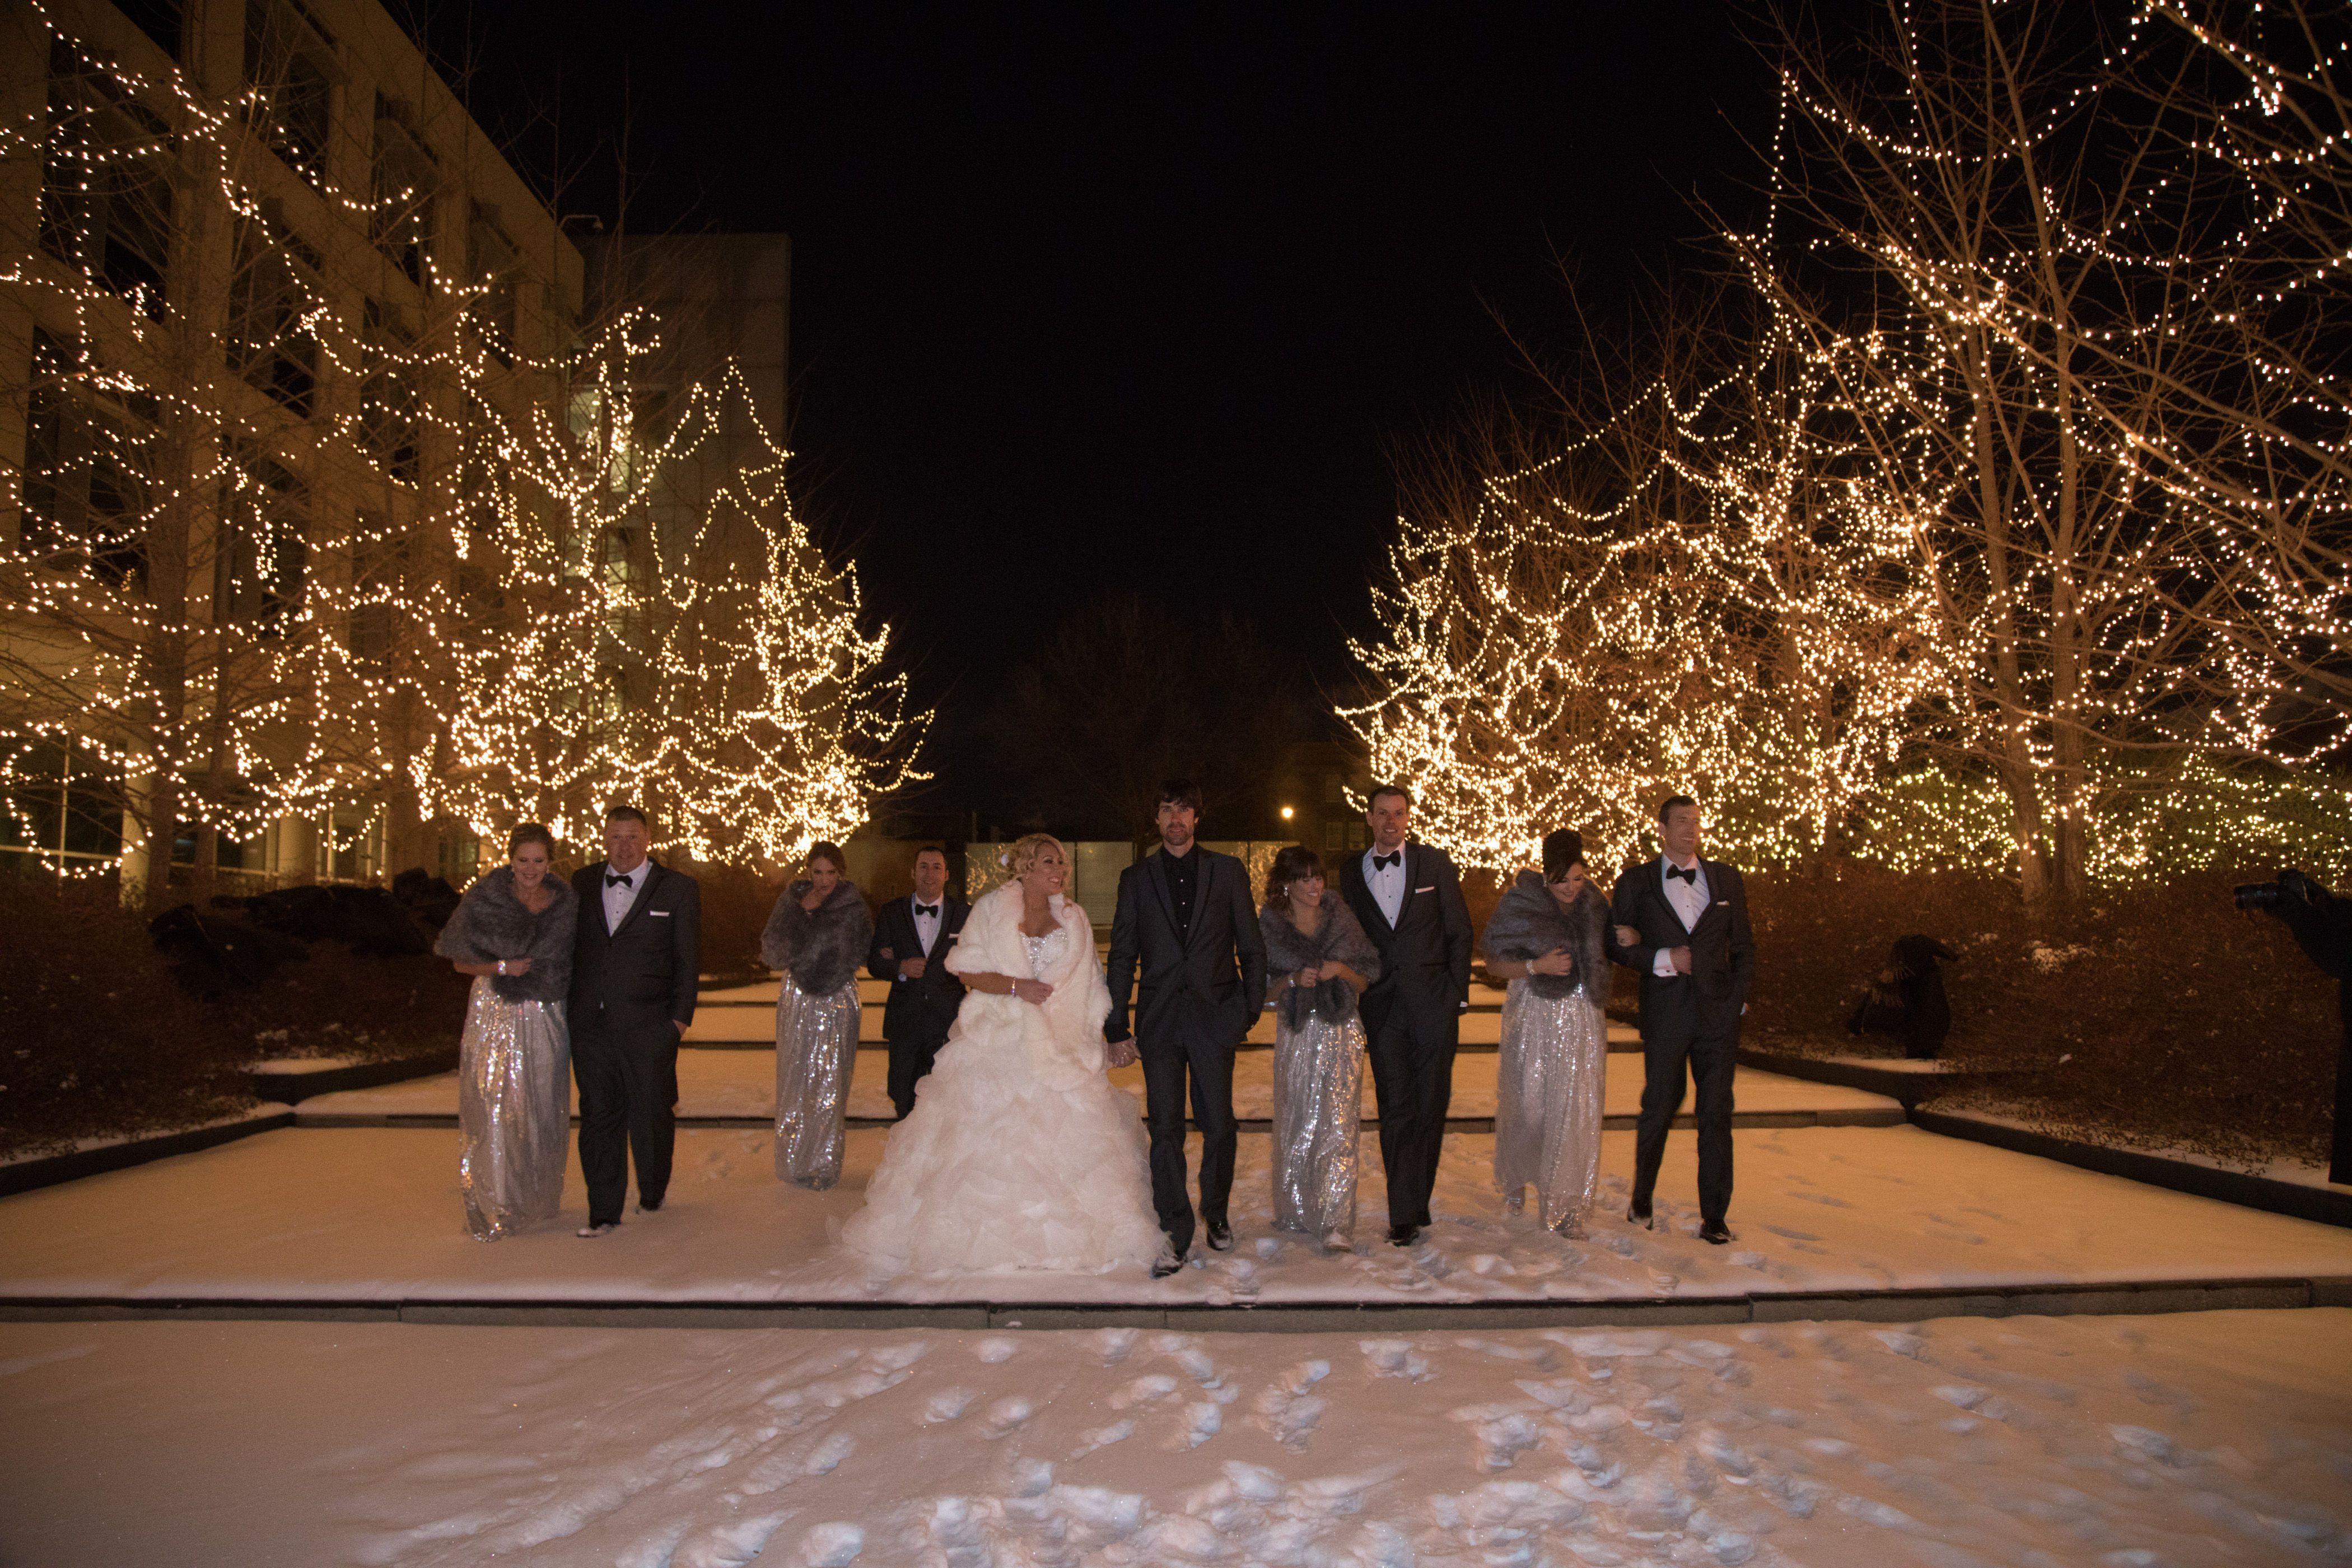 A&S Wedding | Wedding, Wedding party, Wedding day